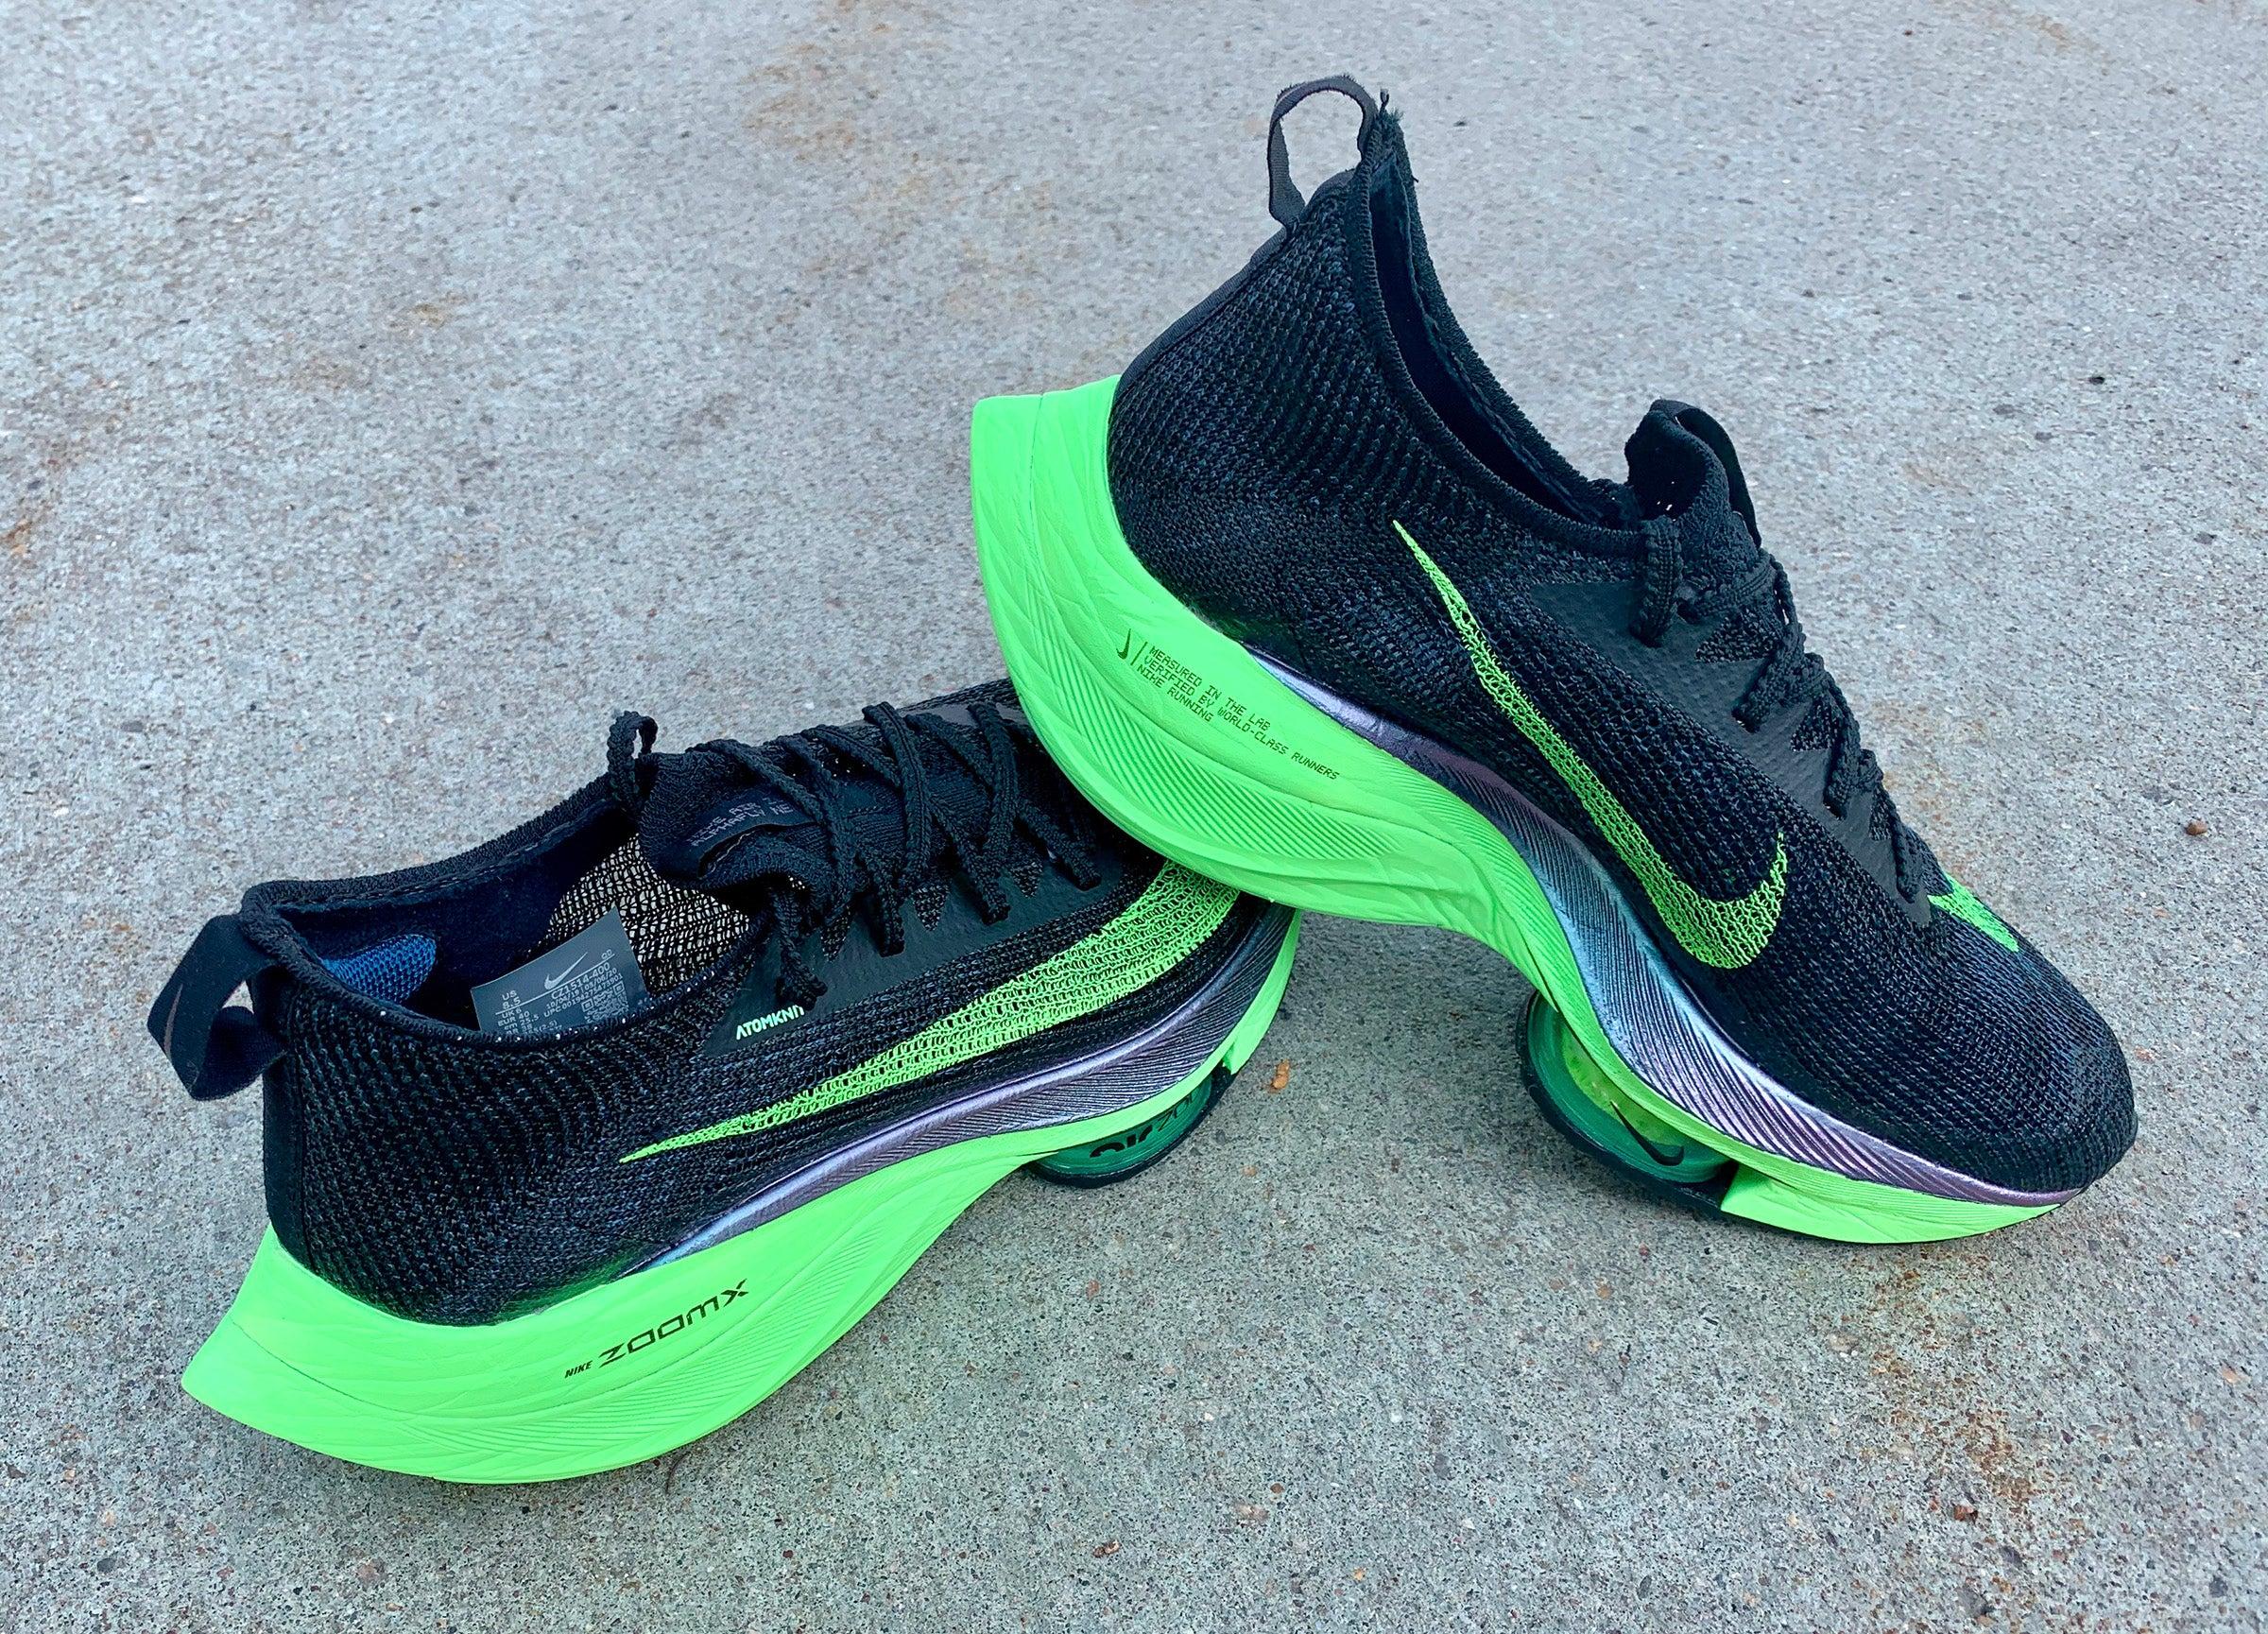 Nike Alphafly super shoe